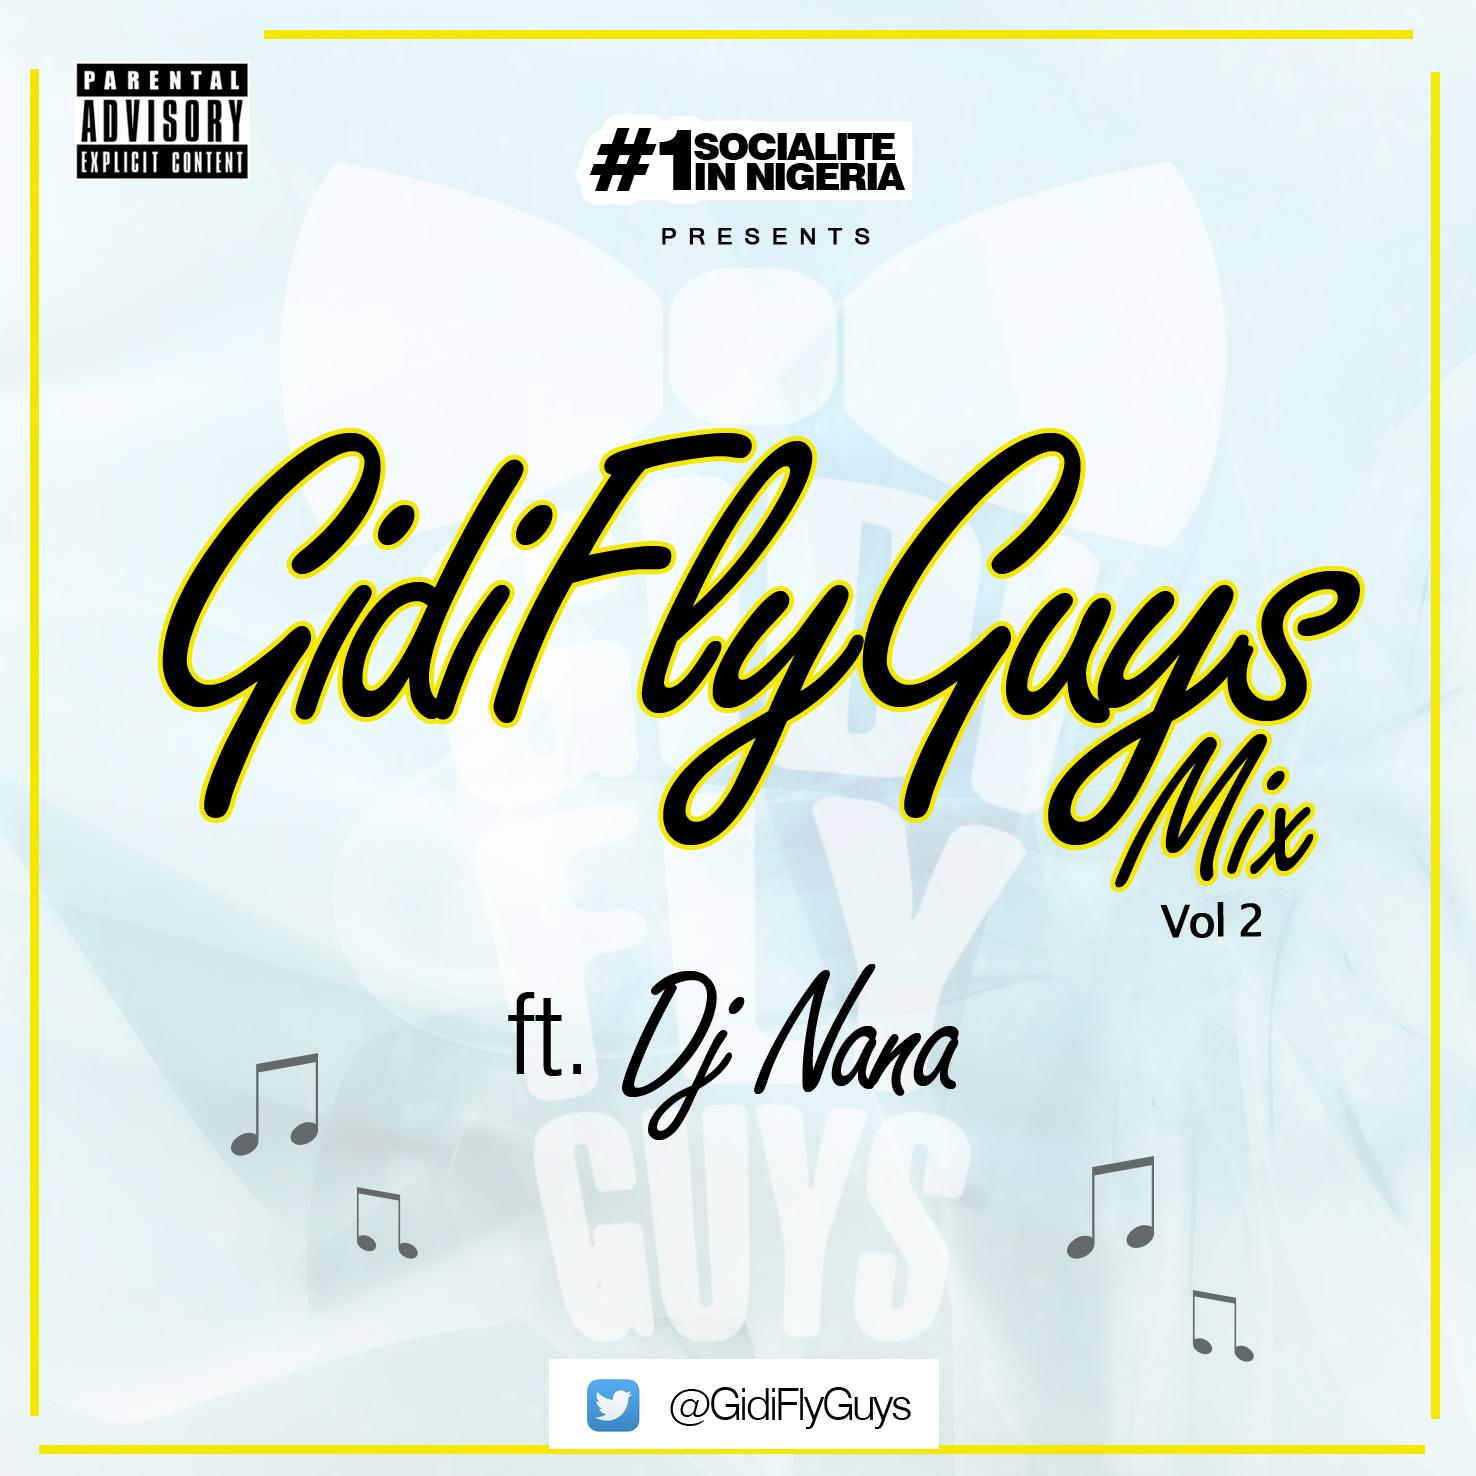 music no 1 socialite in nigeria presents gidiflyguys mix vol 2 ft